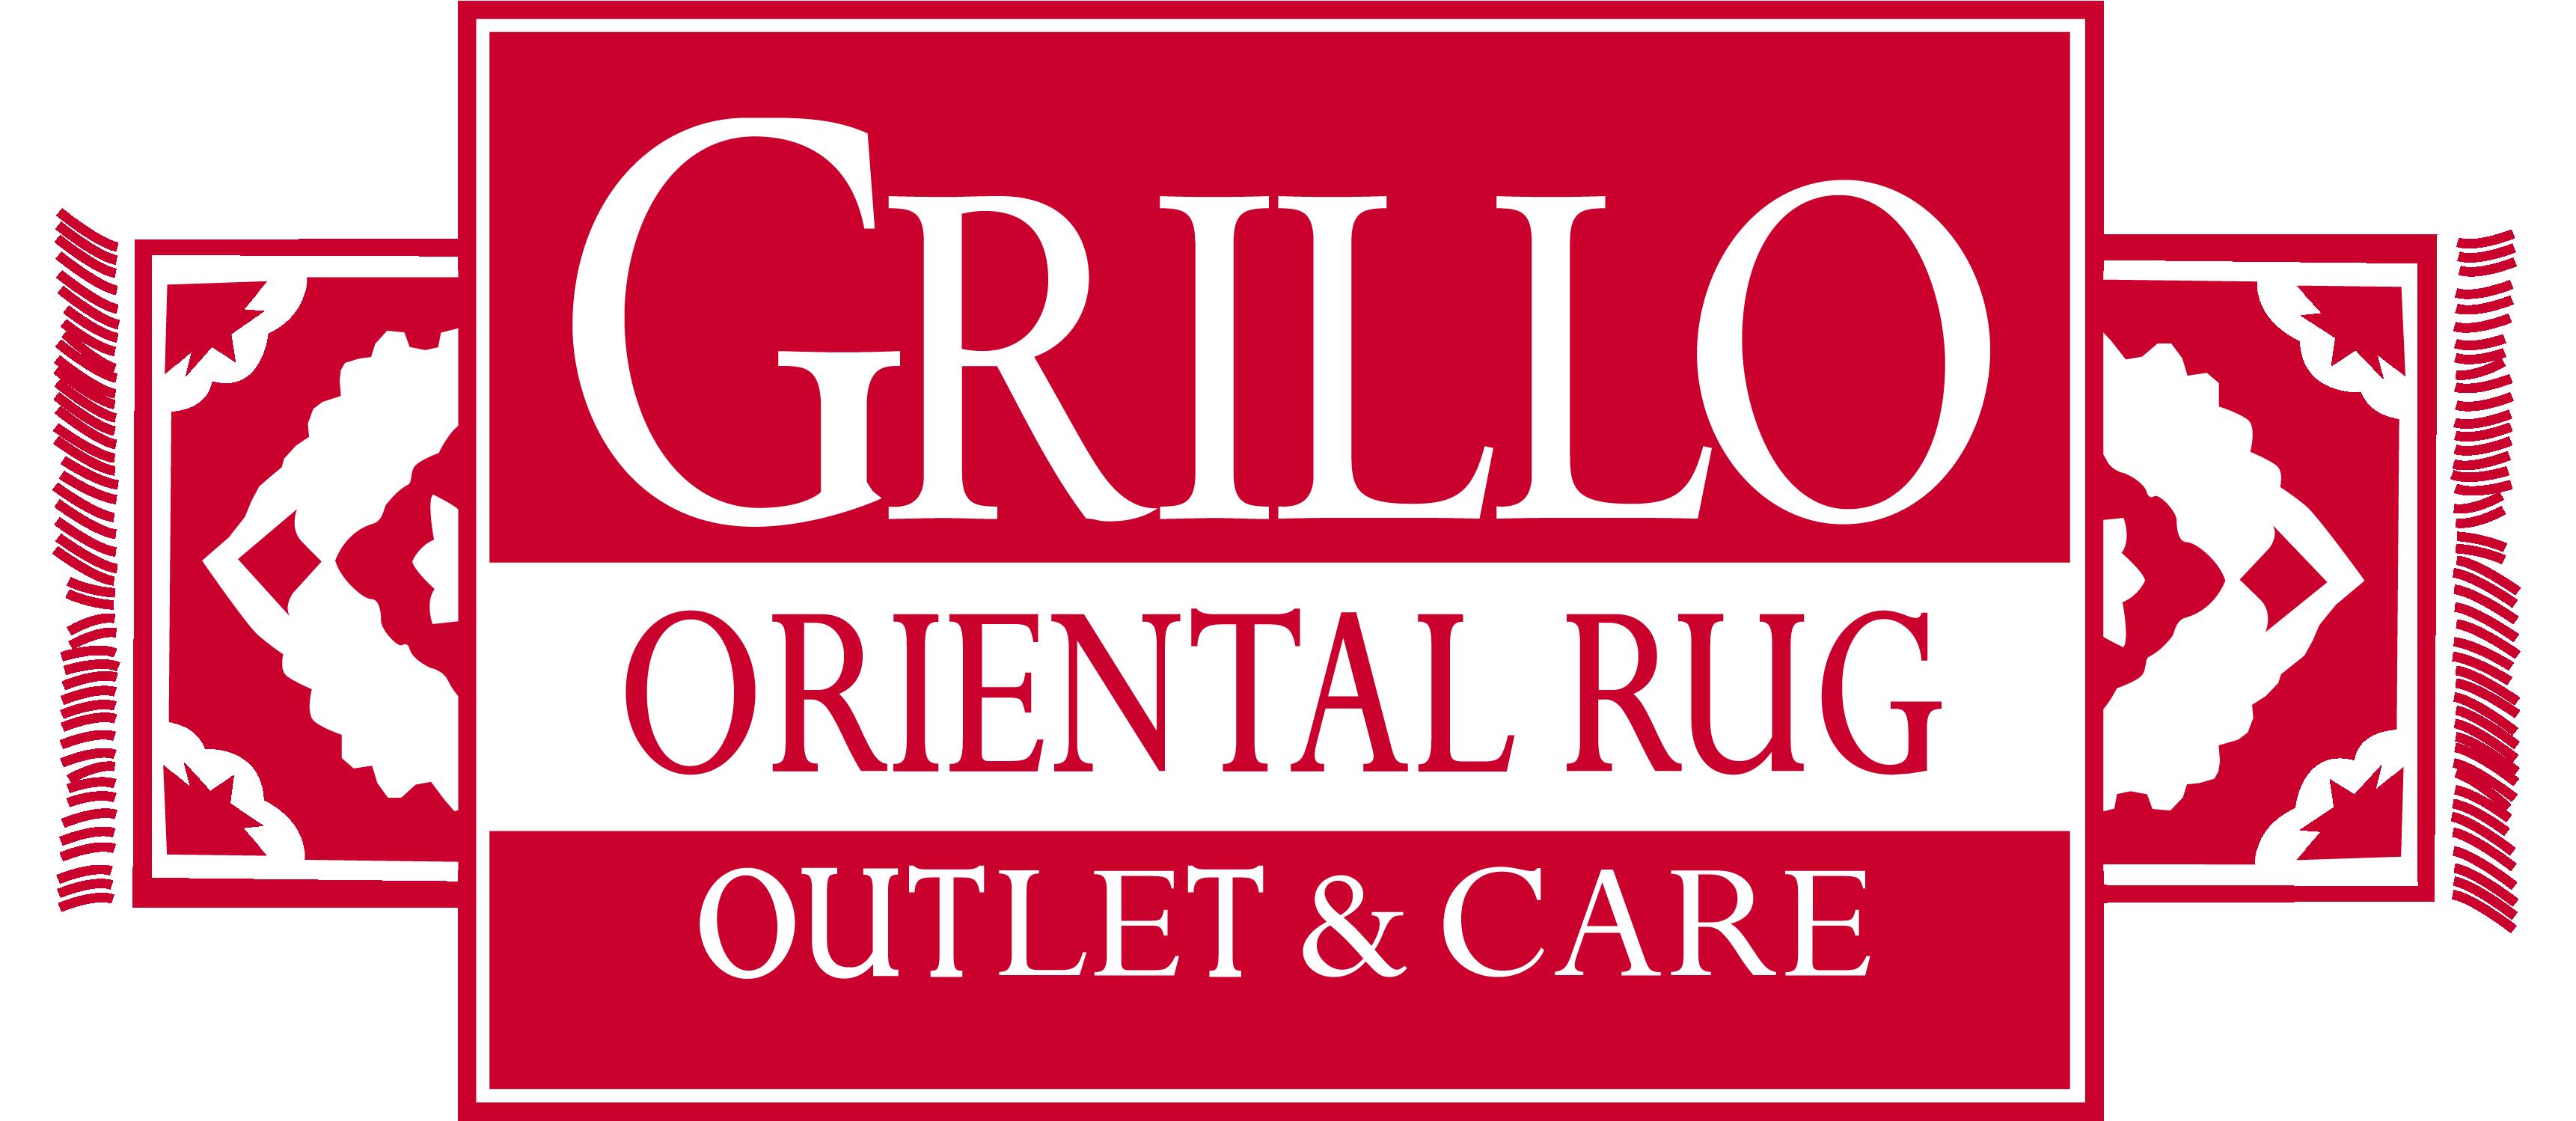 Grillo Oriental Rugs logo